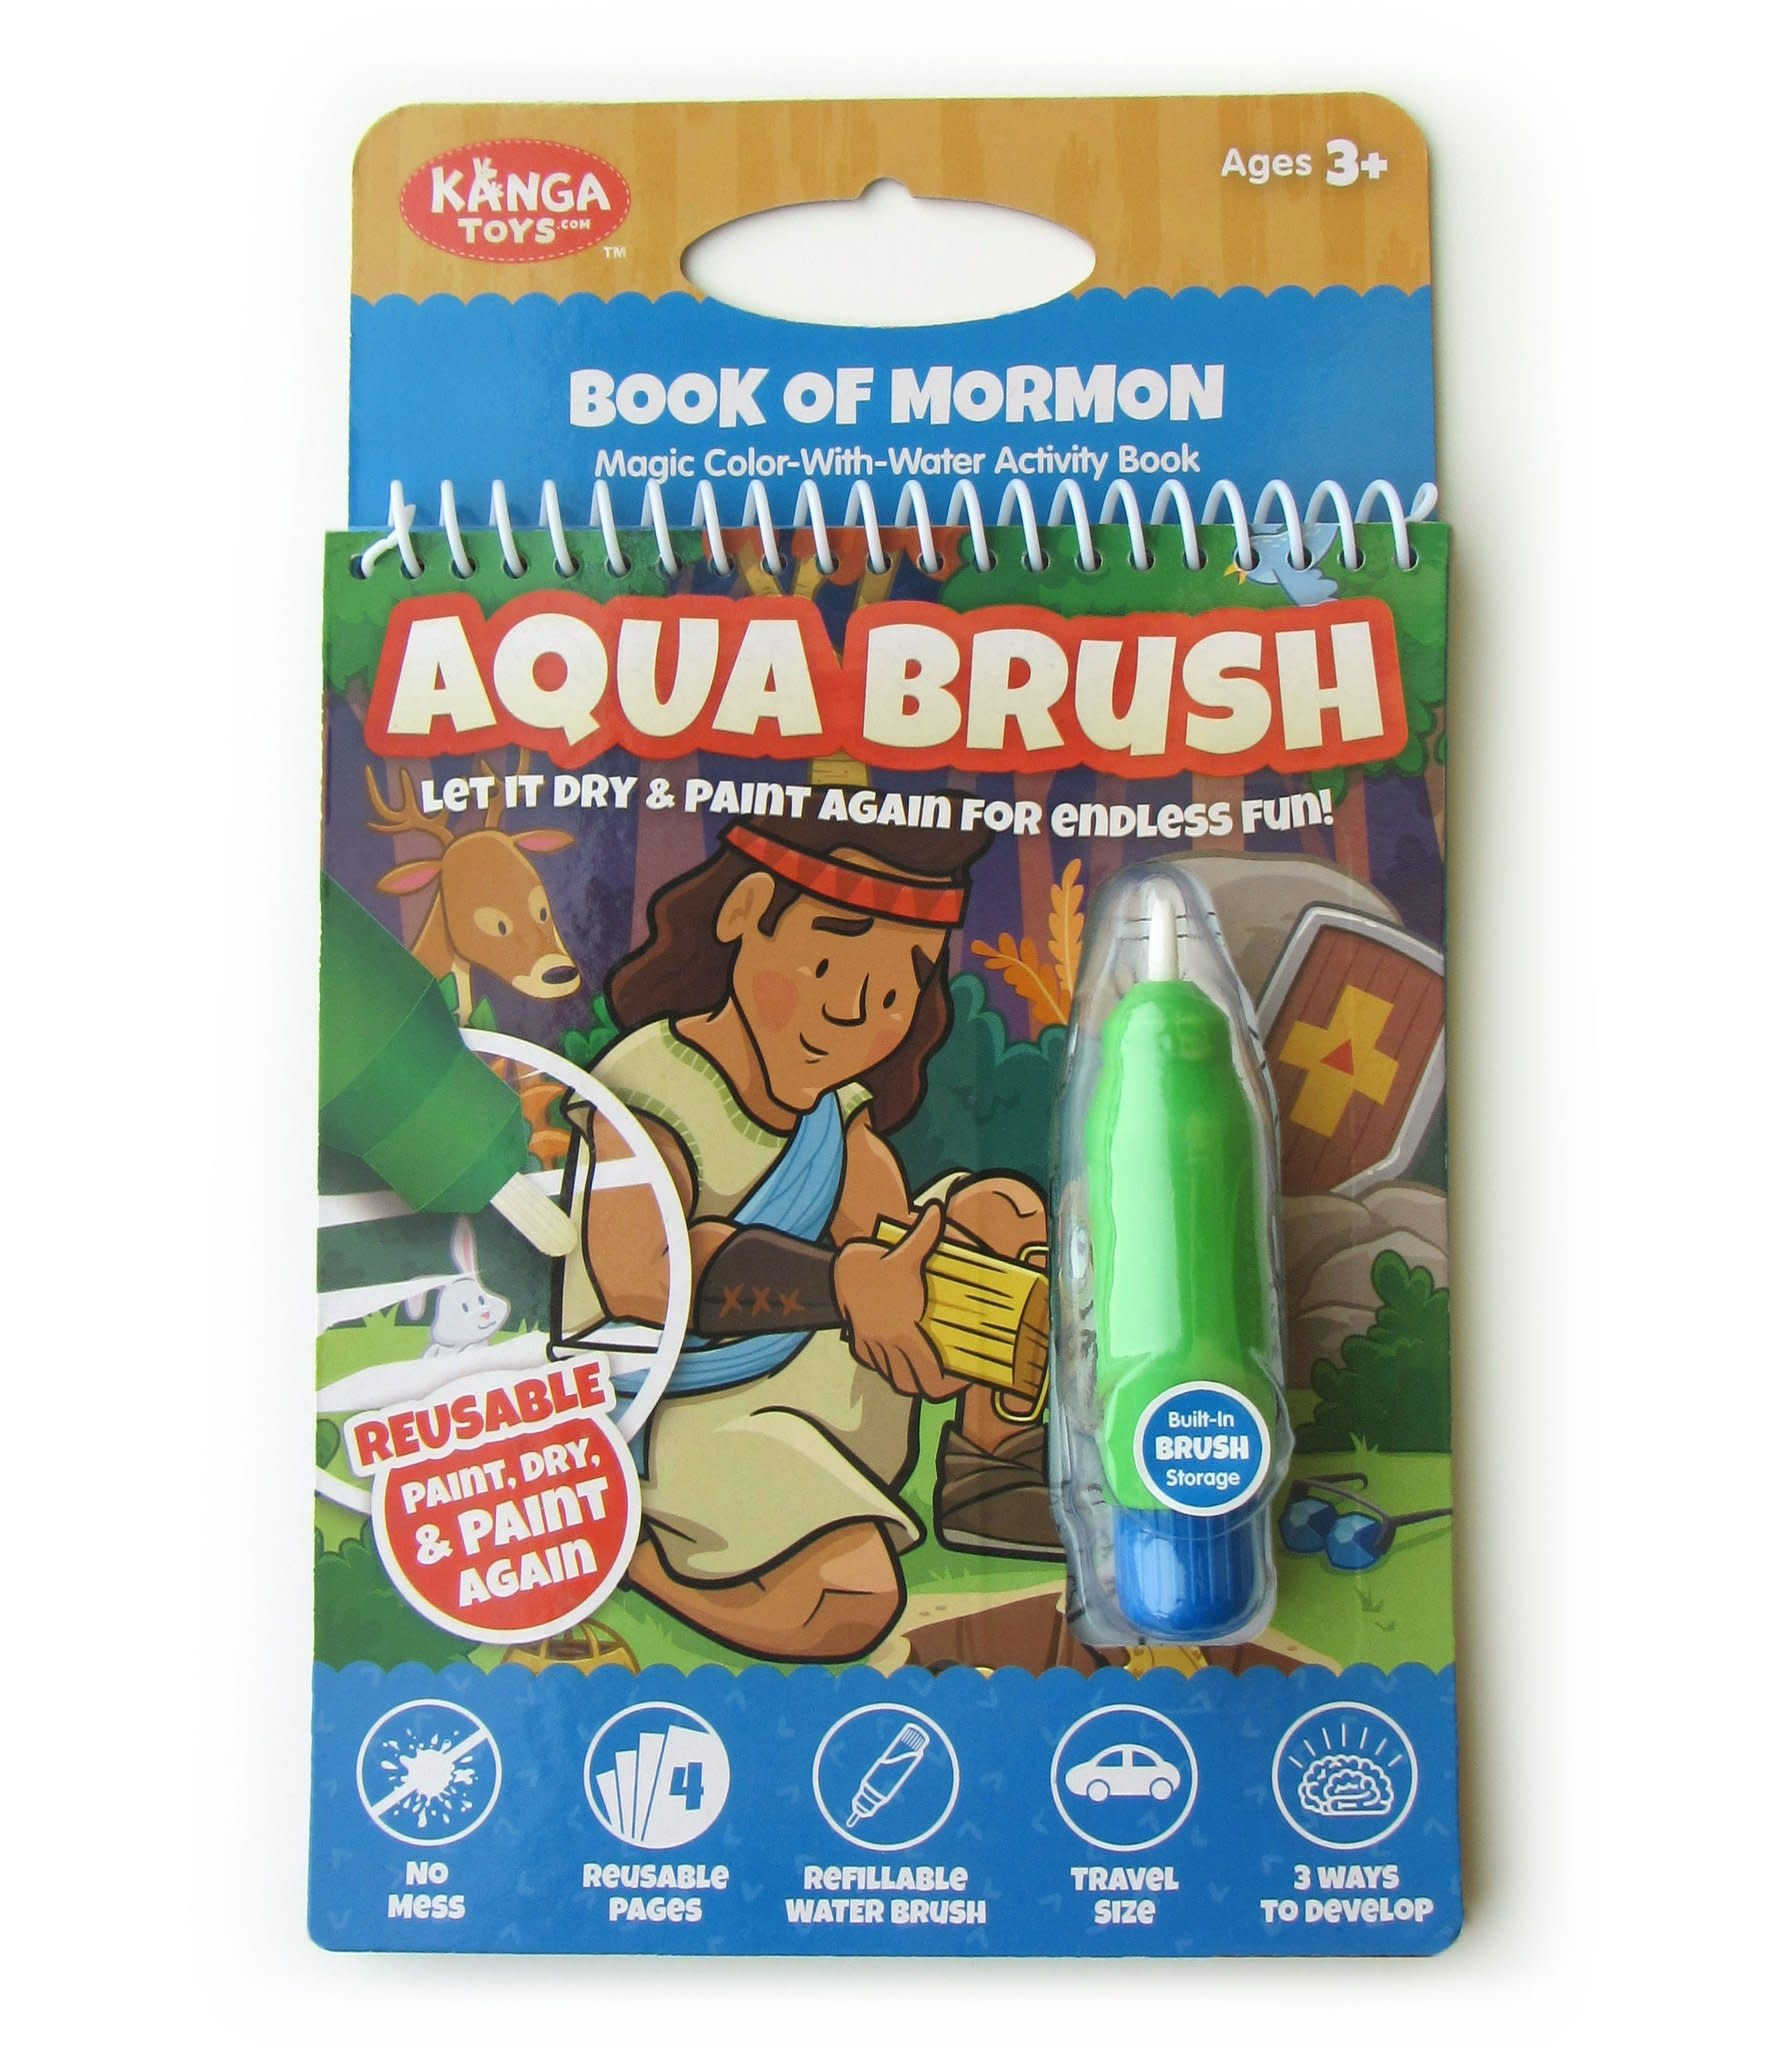 Book of Mormon Aqua Brush Activity Book, Reusable Travel Activity